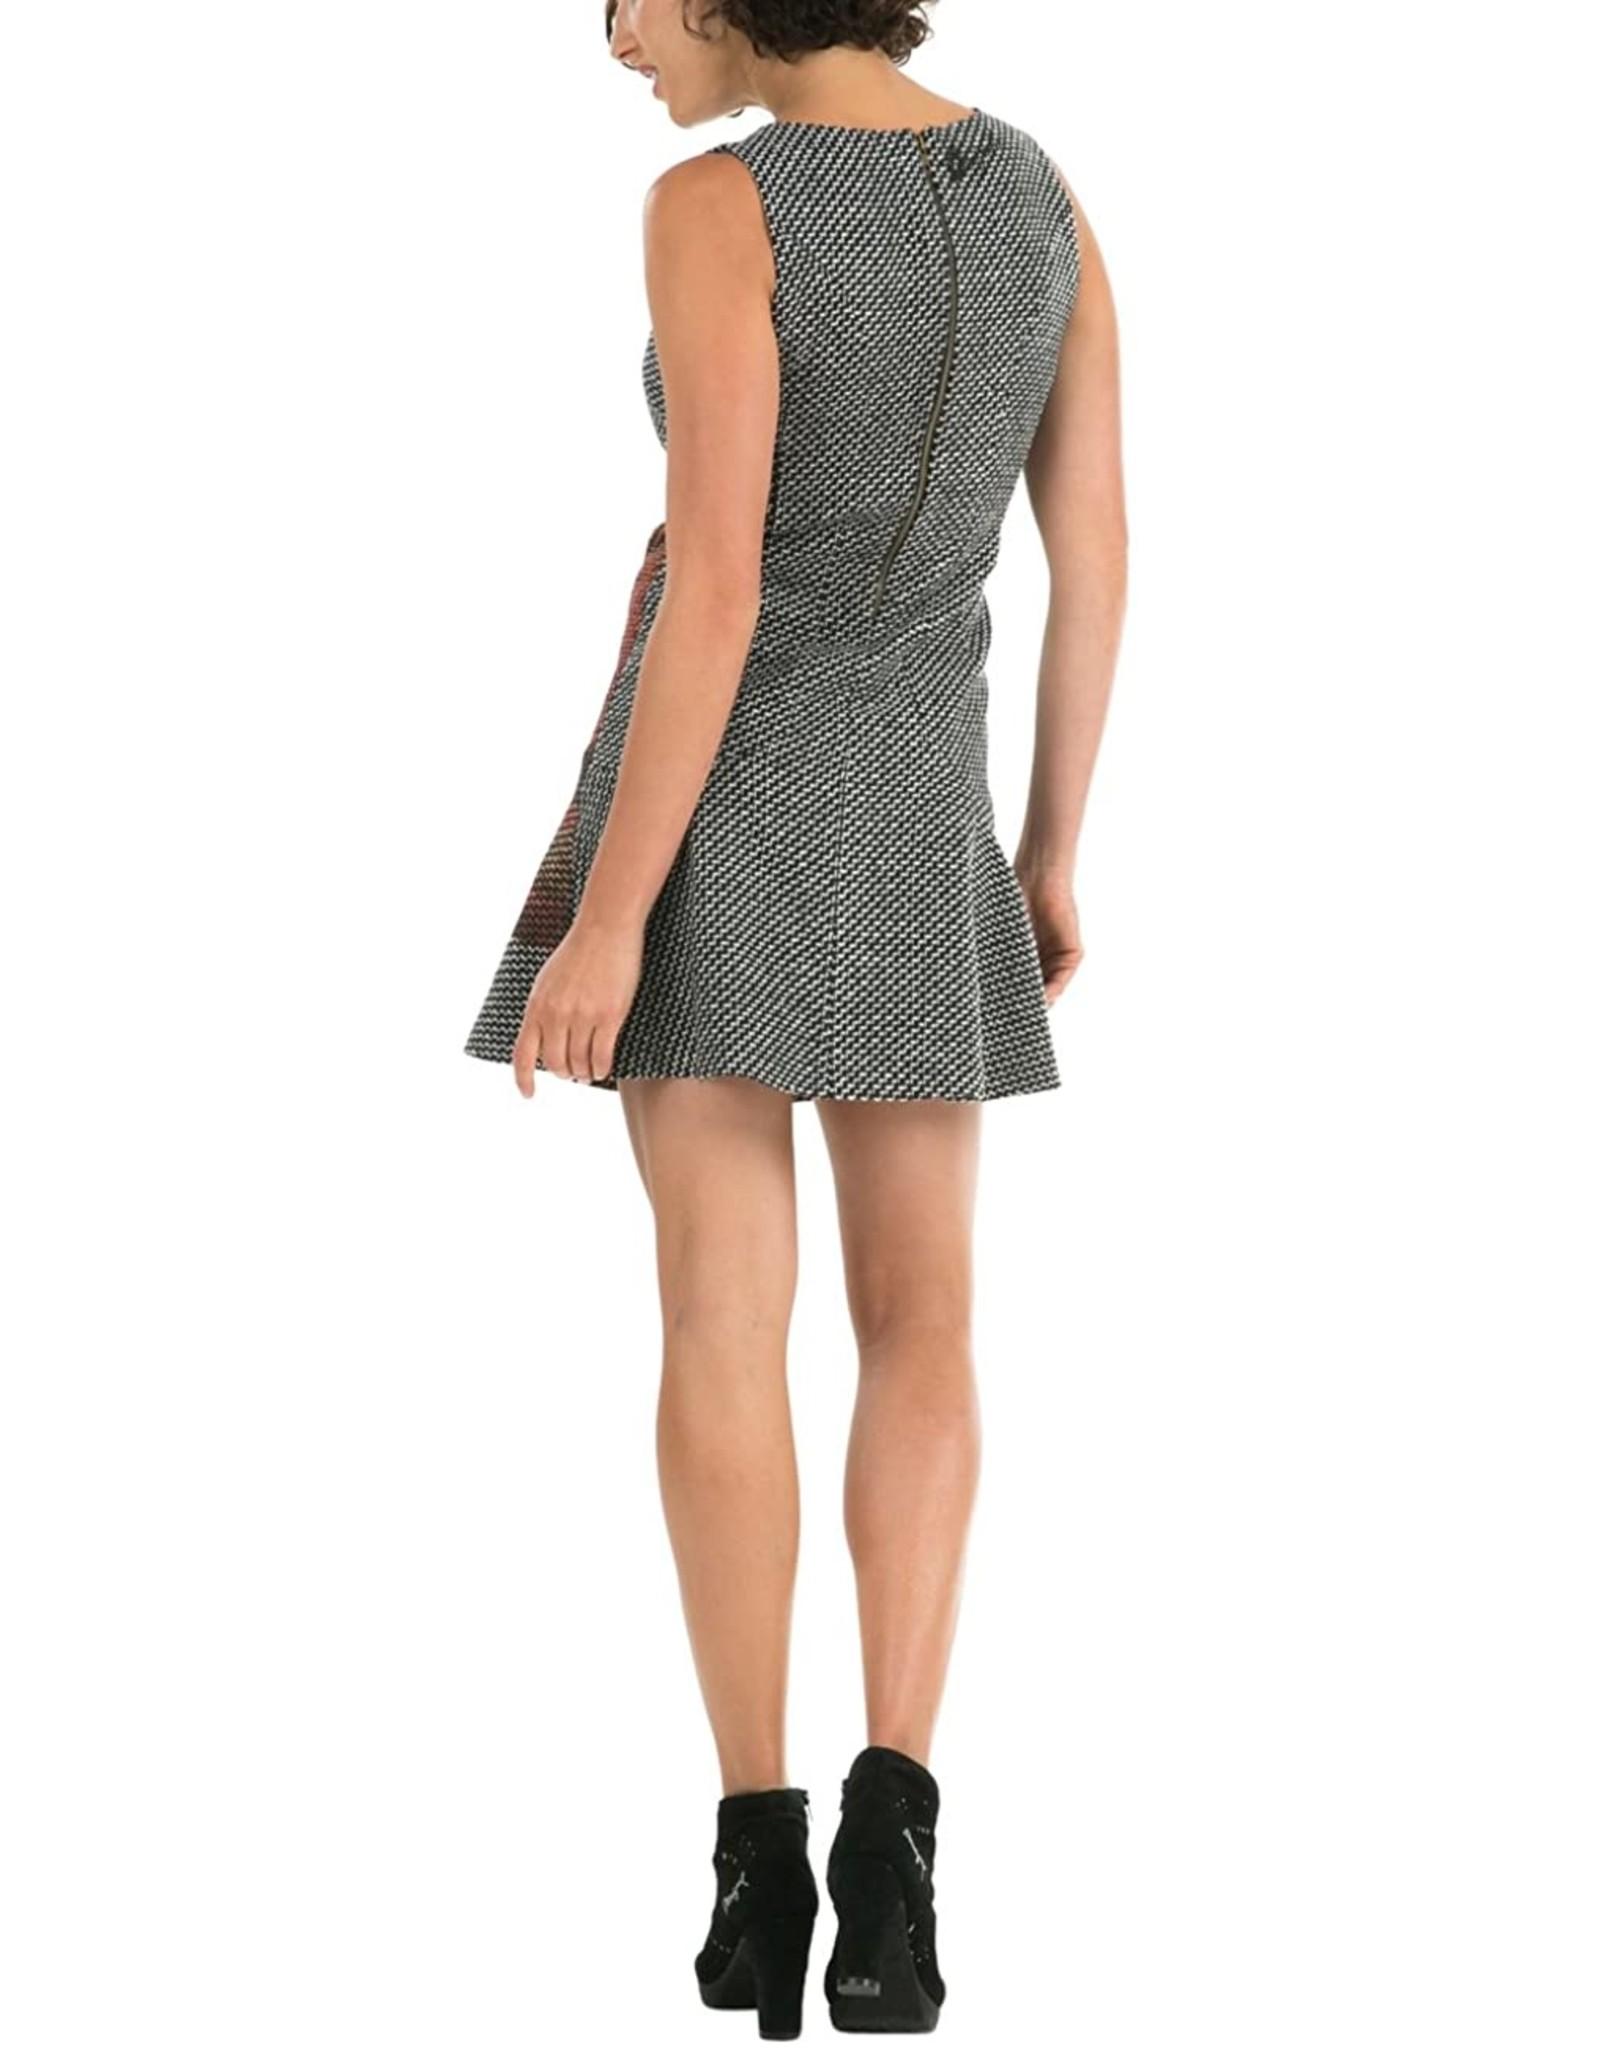 DESIGUAL 58V28H5 DRESS